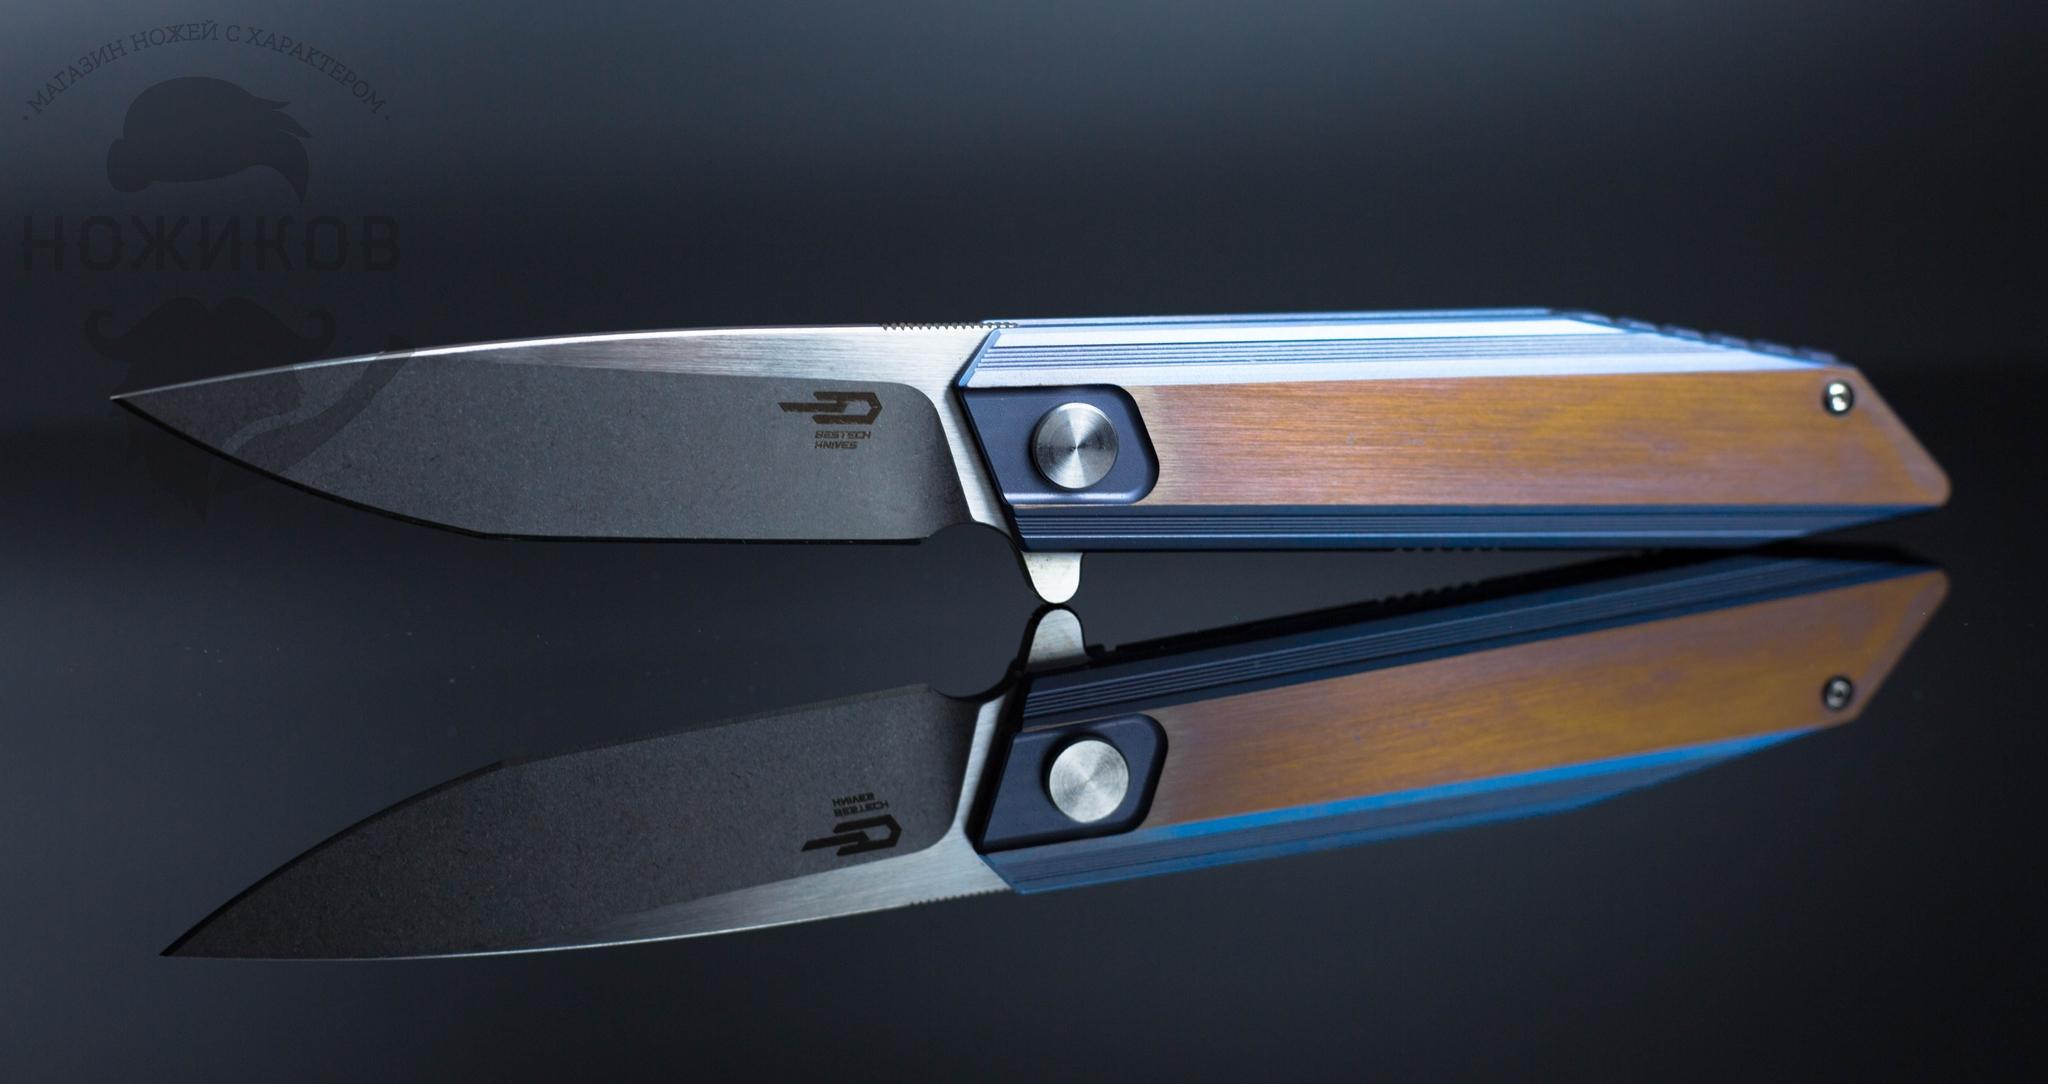 Фото 2 - Складной нож Bestech Knives Shogun BT1701D, сталь CPM-S35VN, рукоять титан